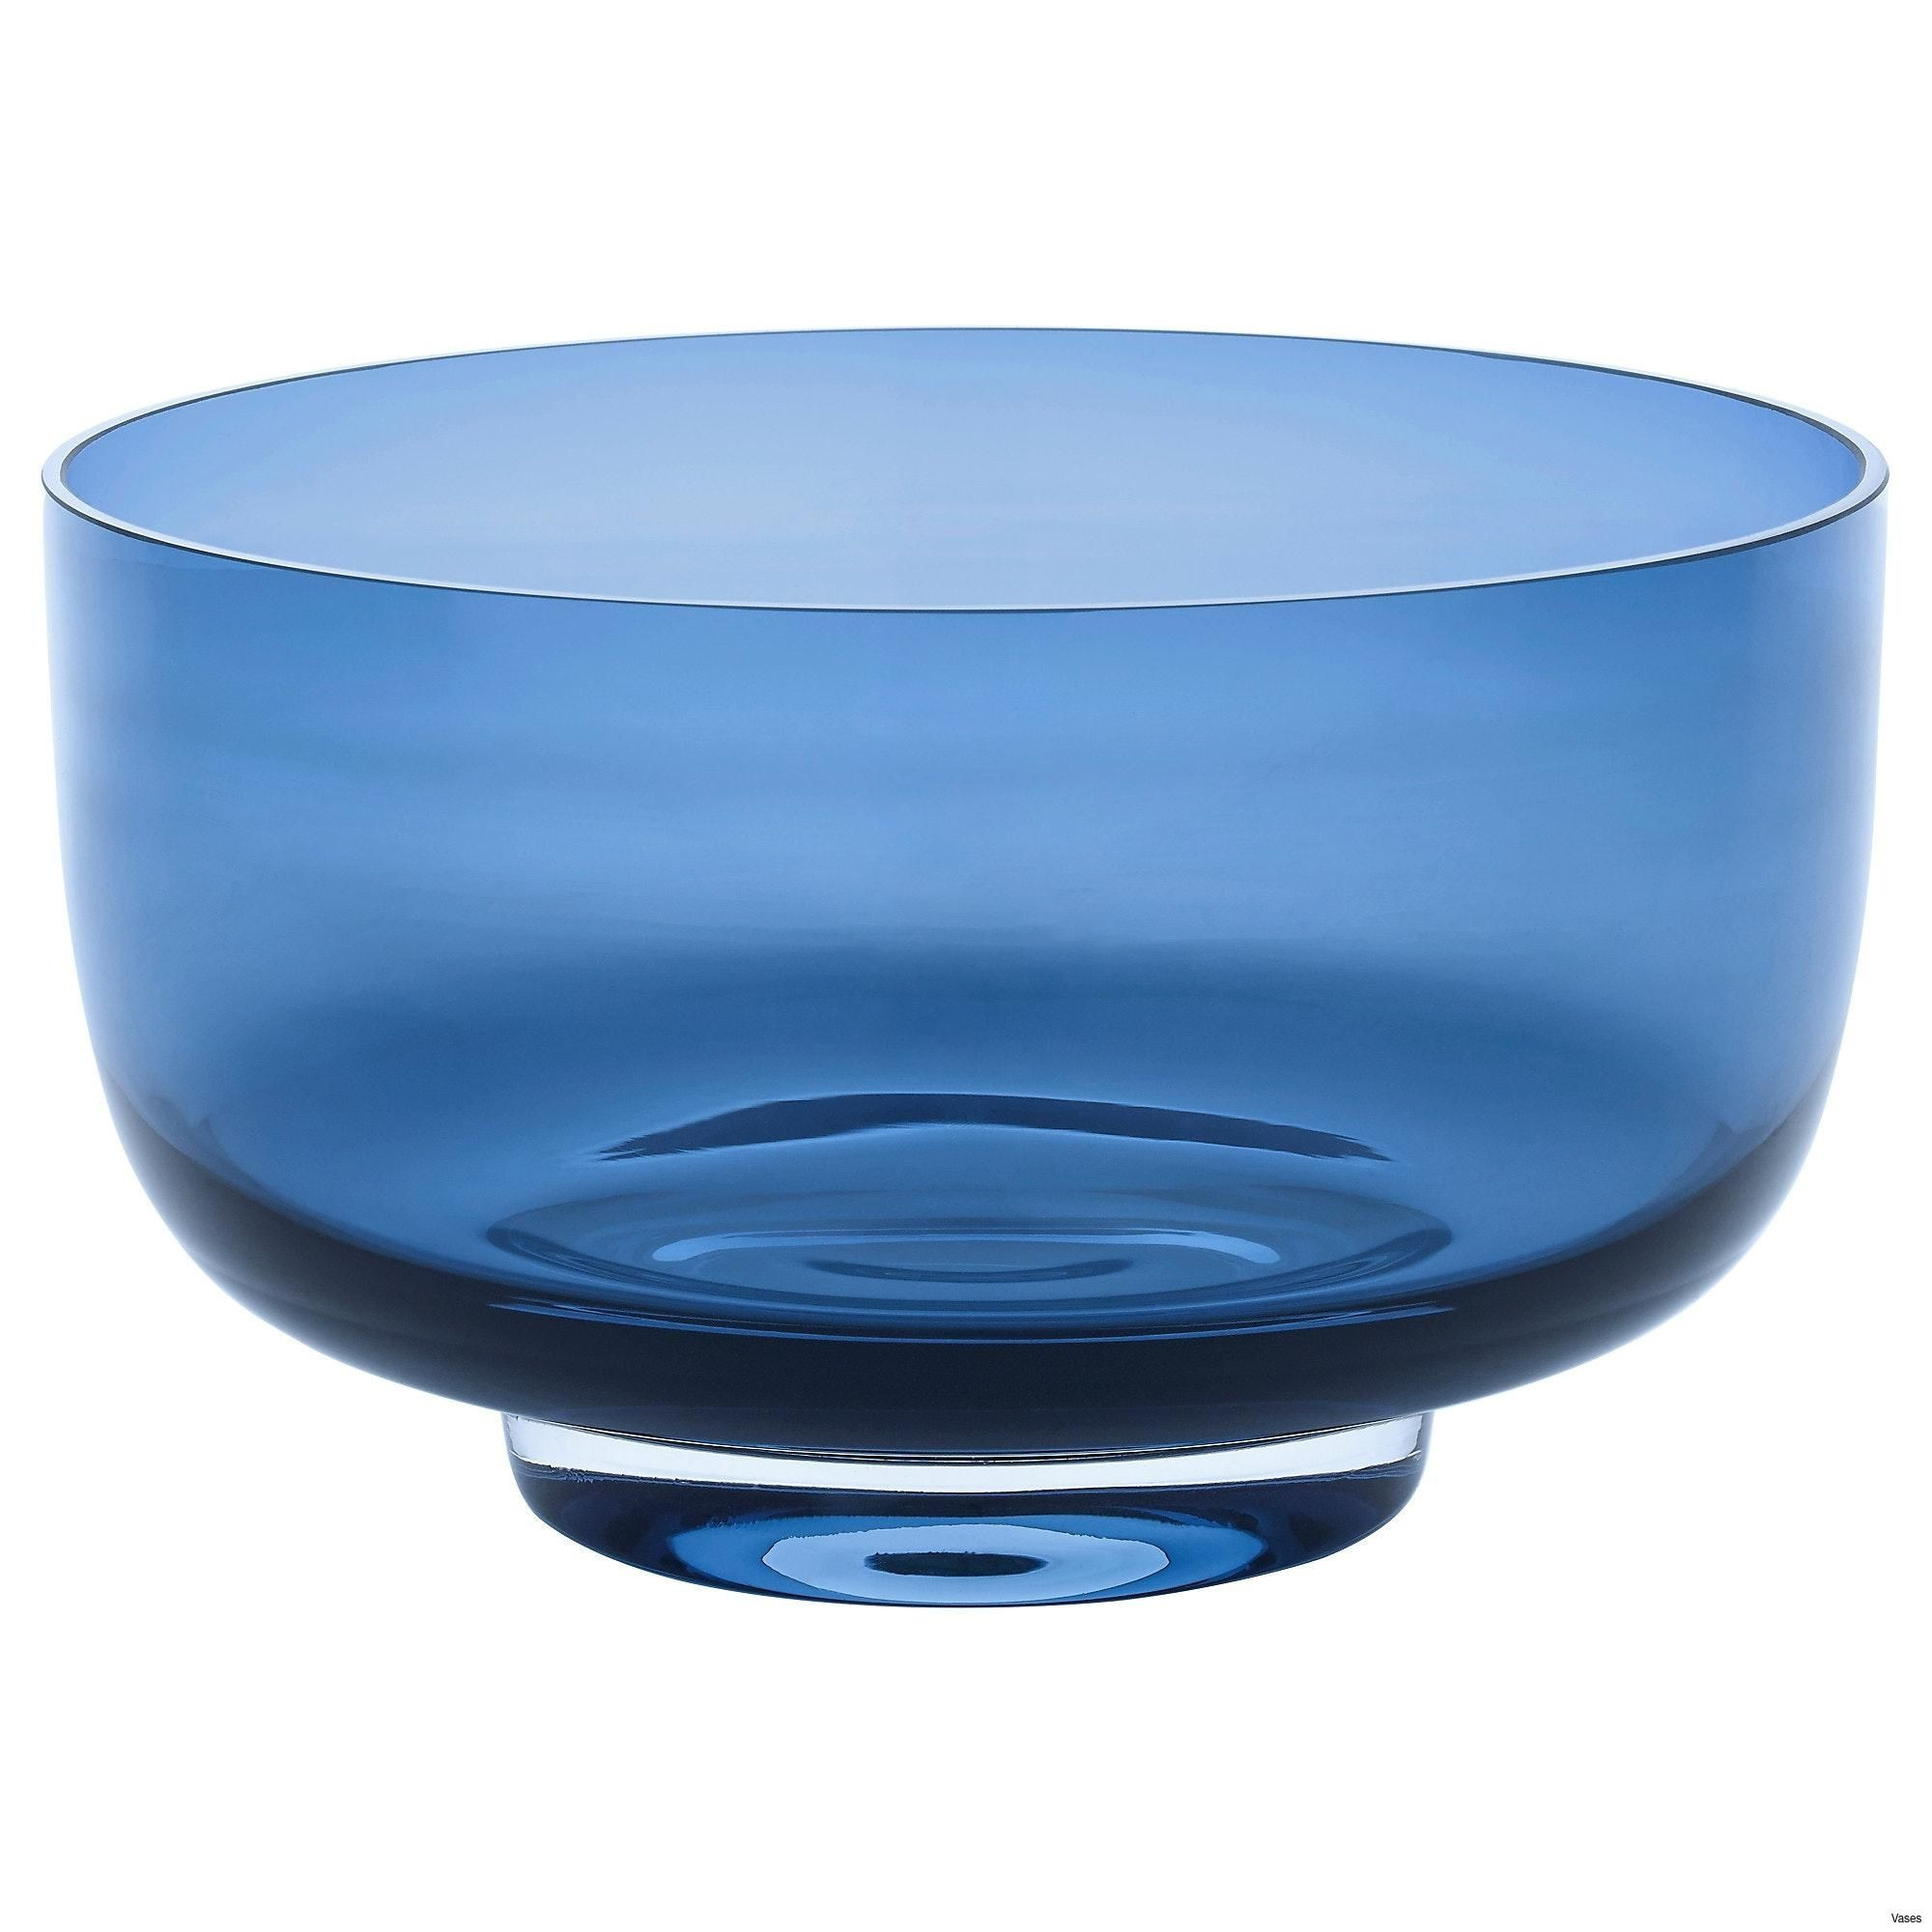 large wine glass vase of blue crystal vase unique decorative glass bowl new living room ikea throughout blue crystal vase unique decorative glass bowl new living room ikea vases awesome pe s5h